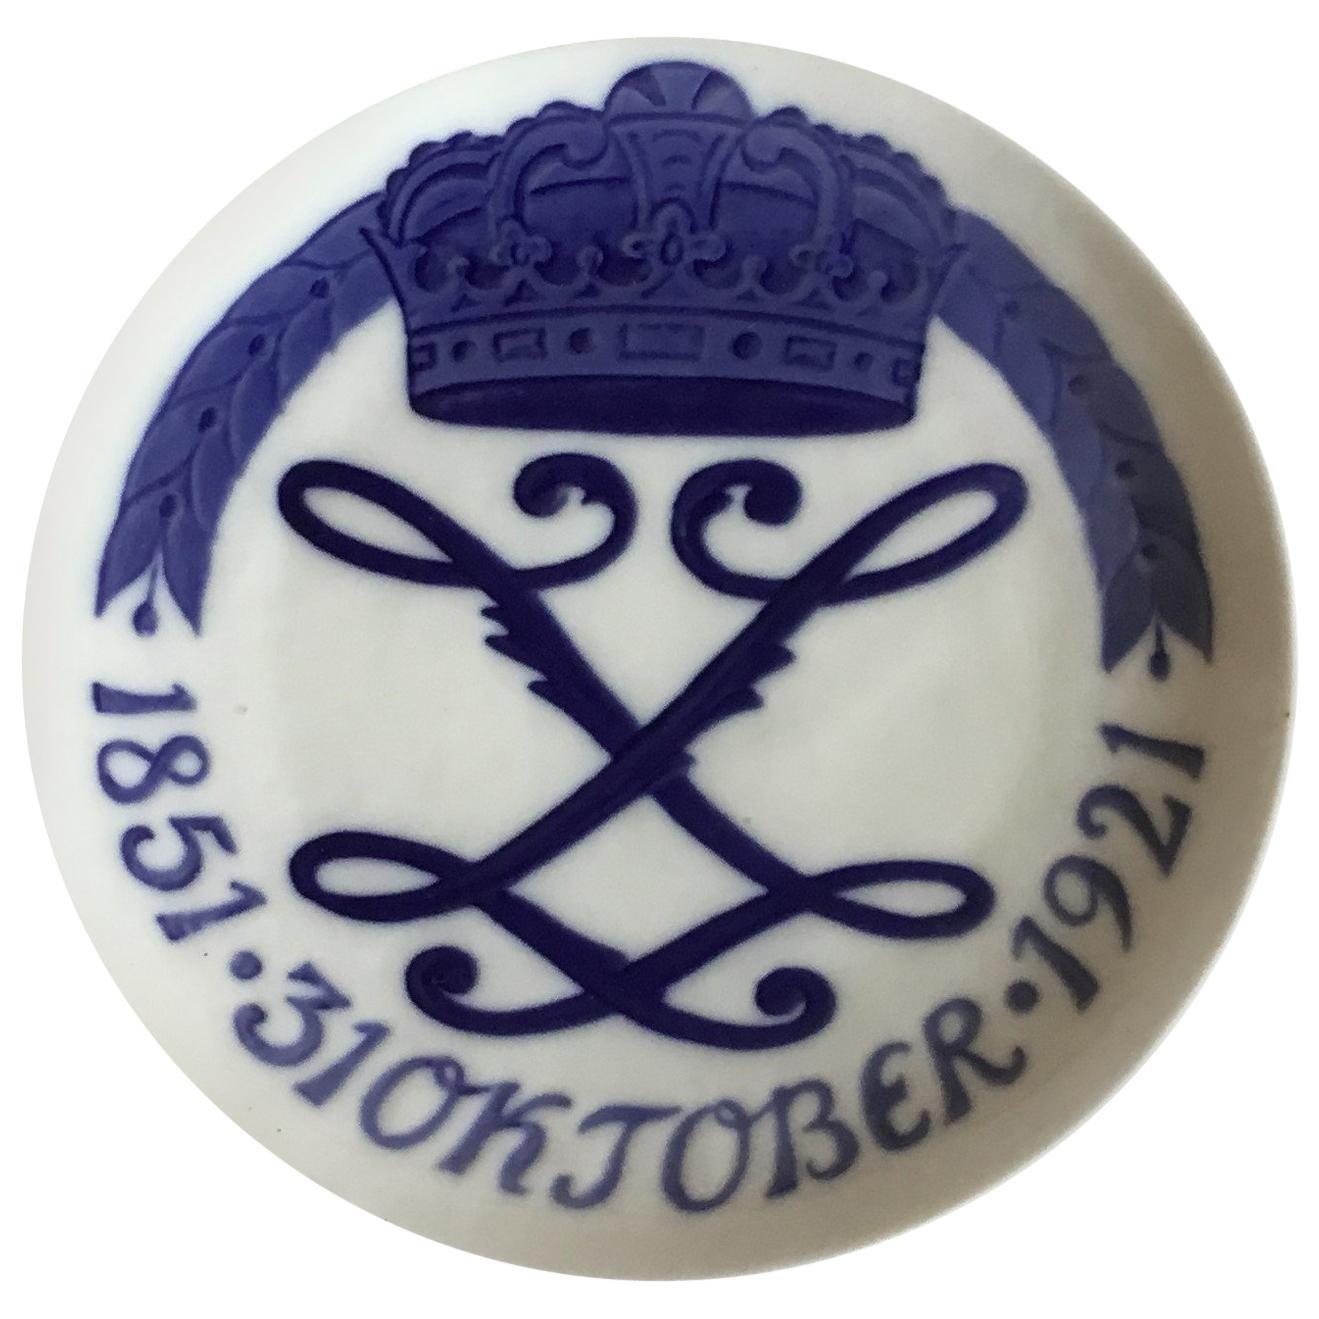 Royal Copenhagen Commemorative Plate from 1921 RC-CM202